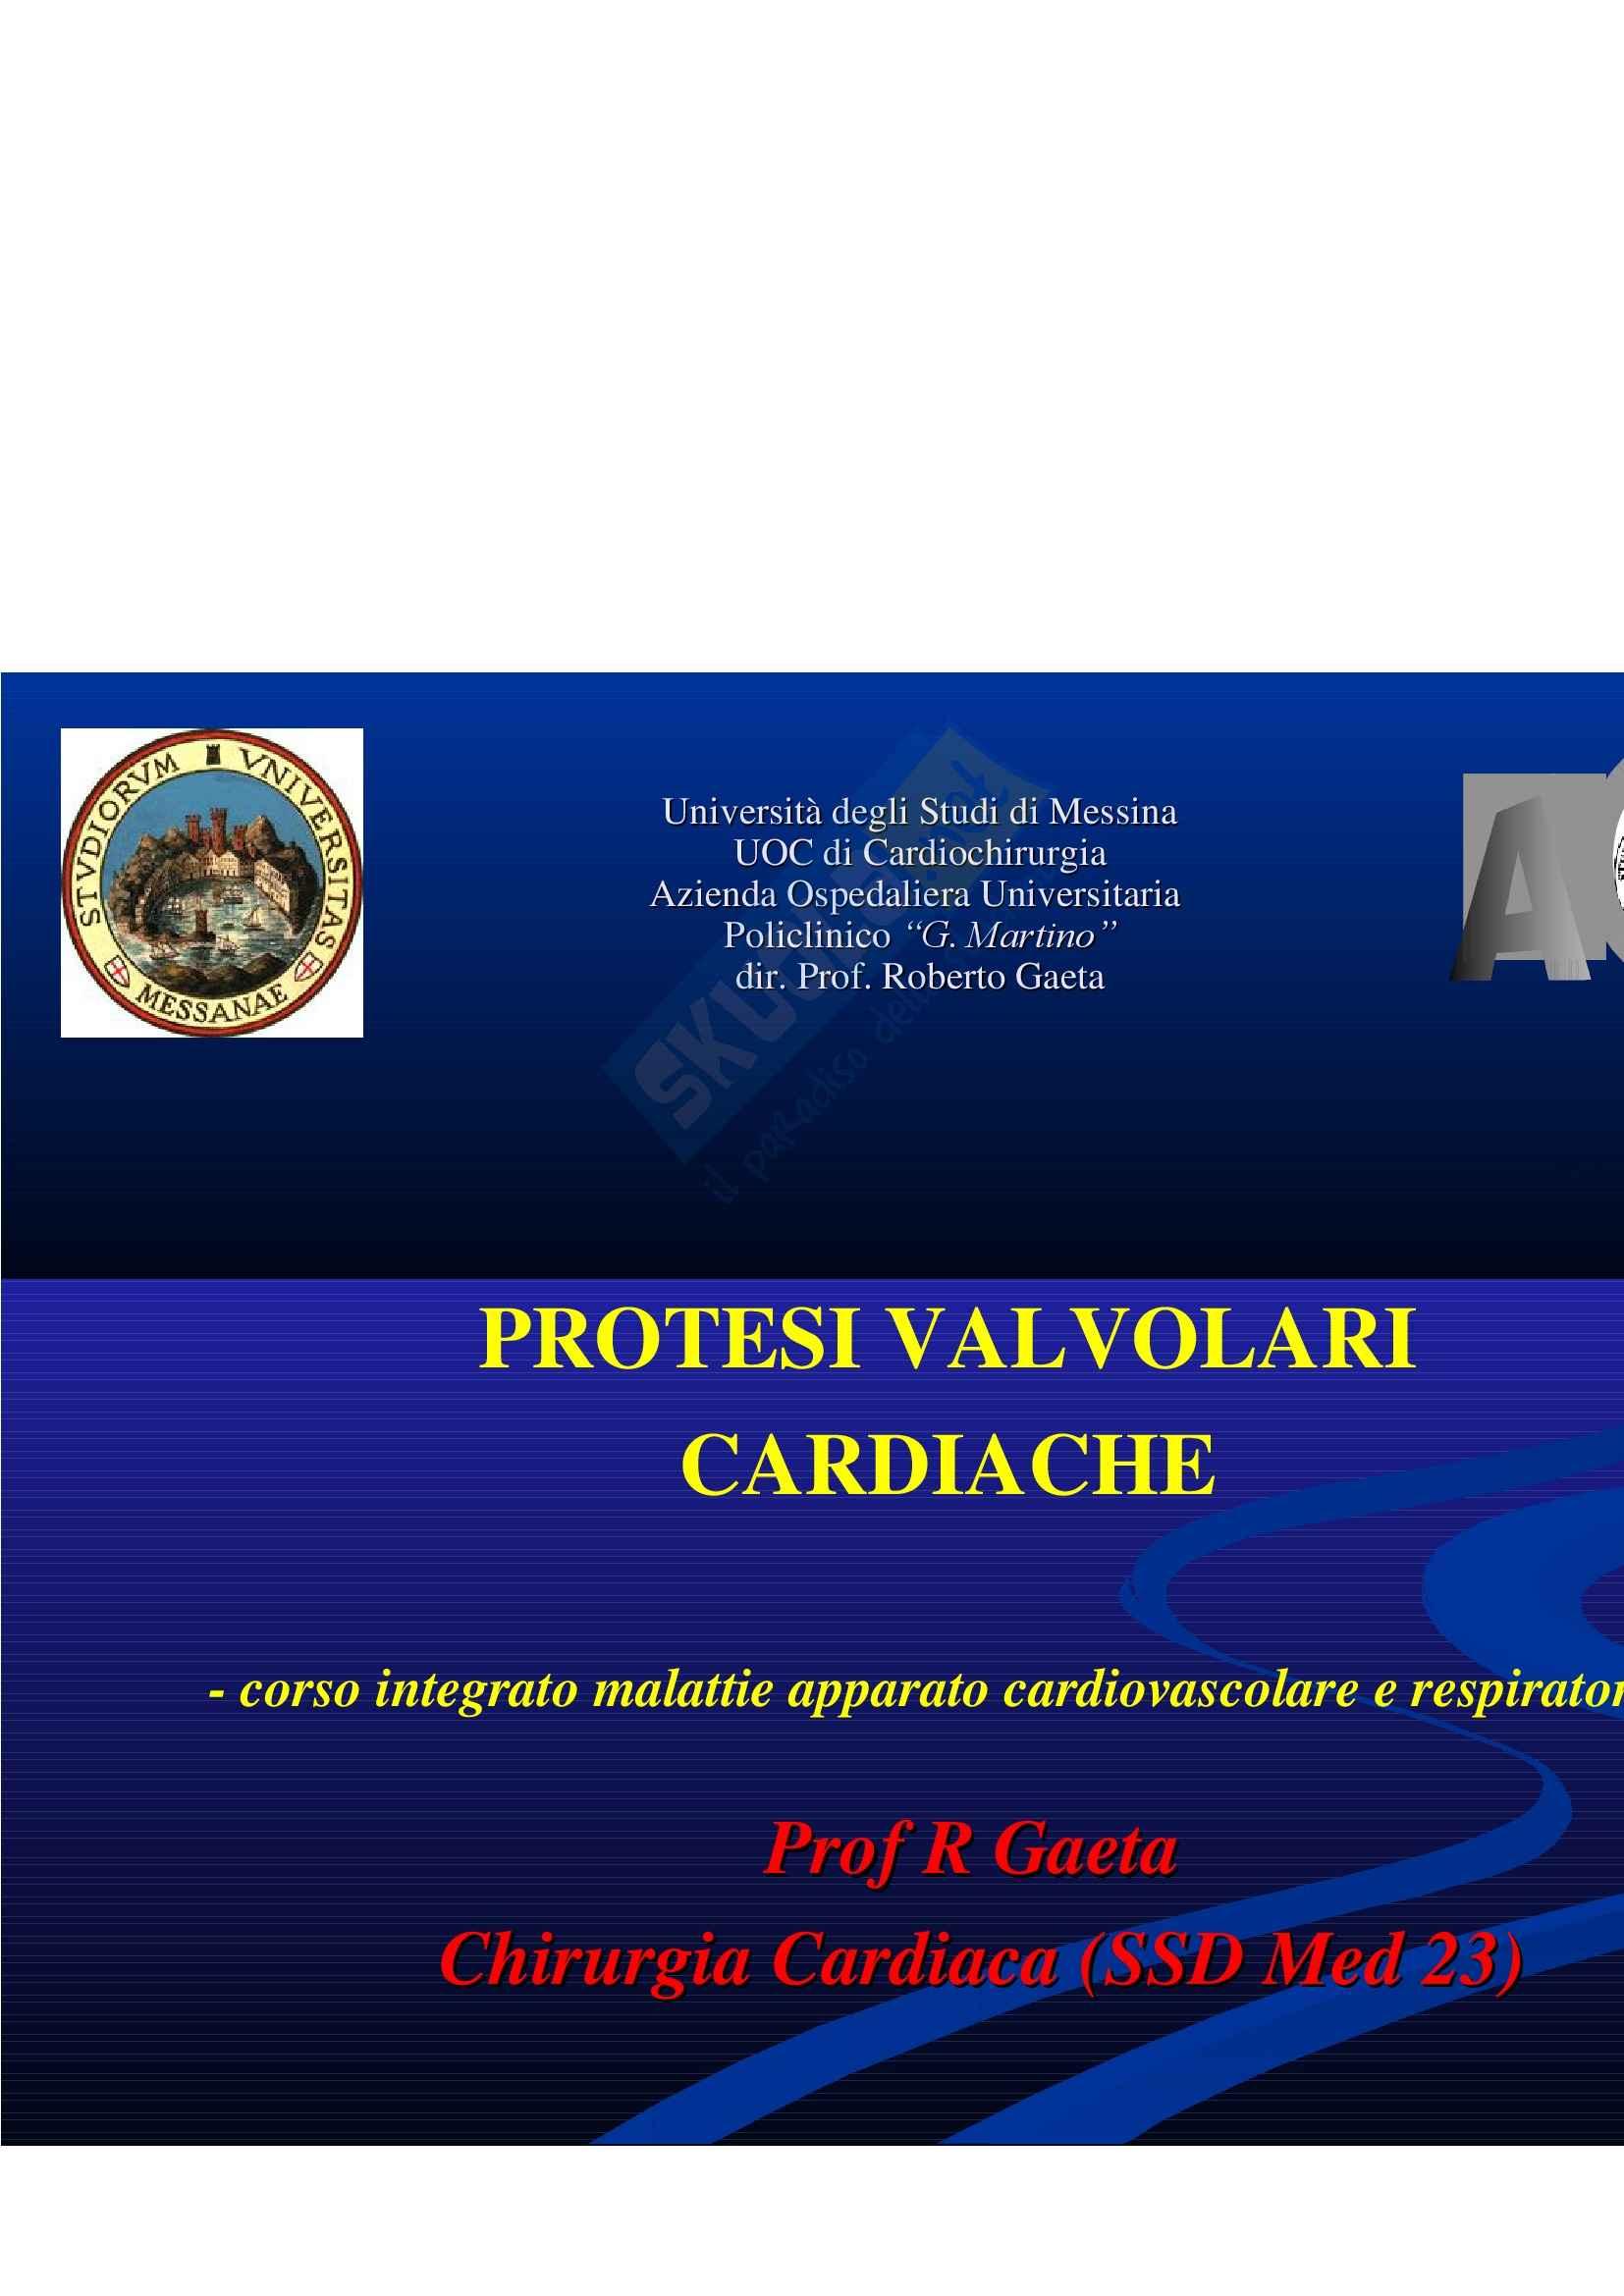 Cardiologia - protesi valvolari cardiache